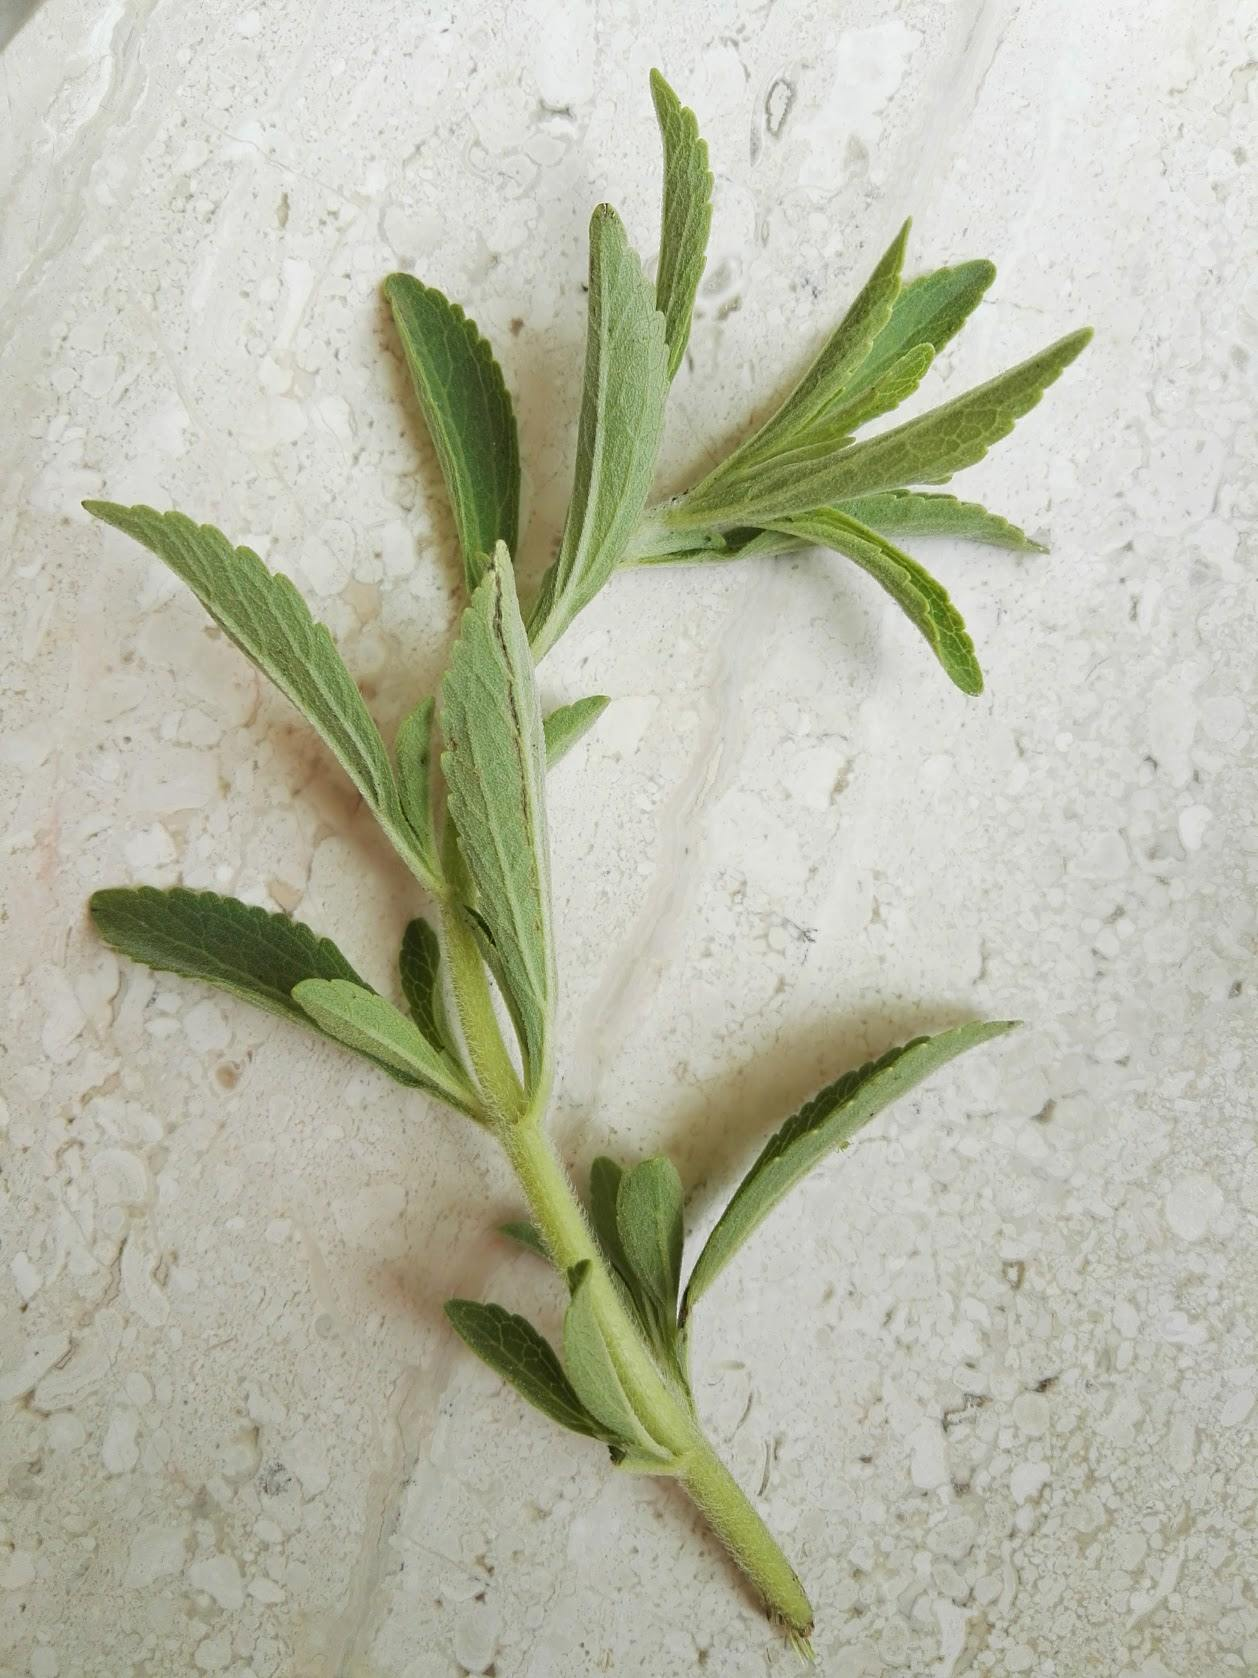 Studie belegt: Stevia kann bei Borreliose helfen